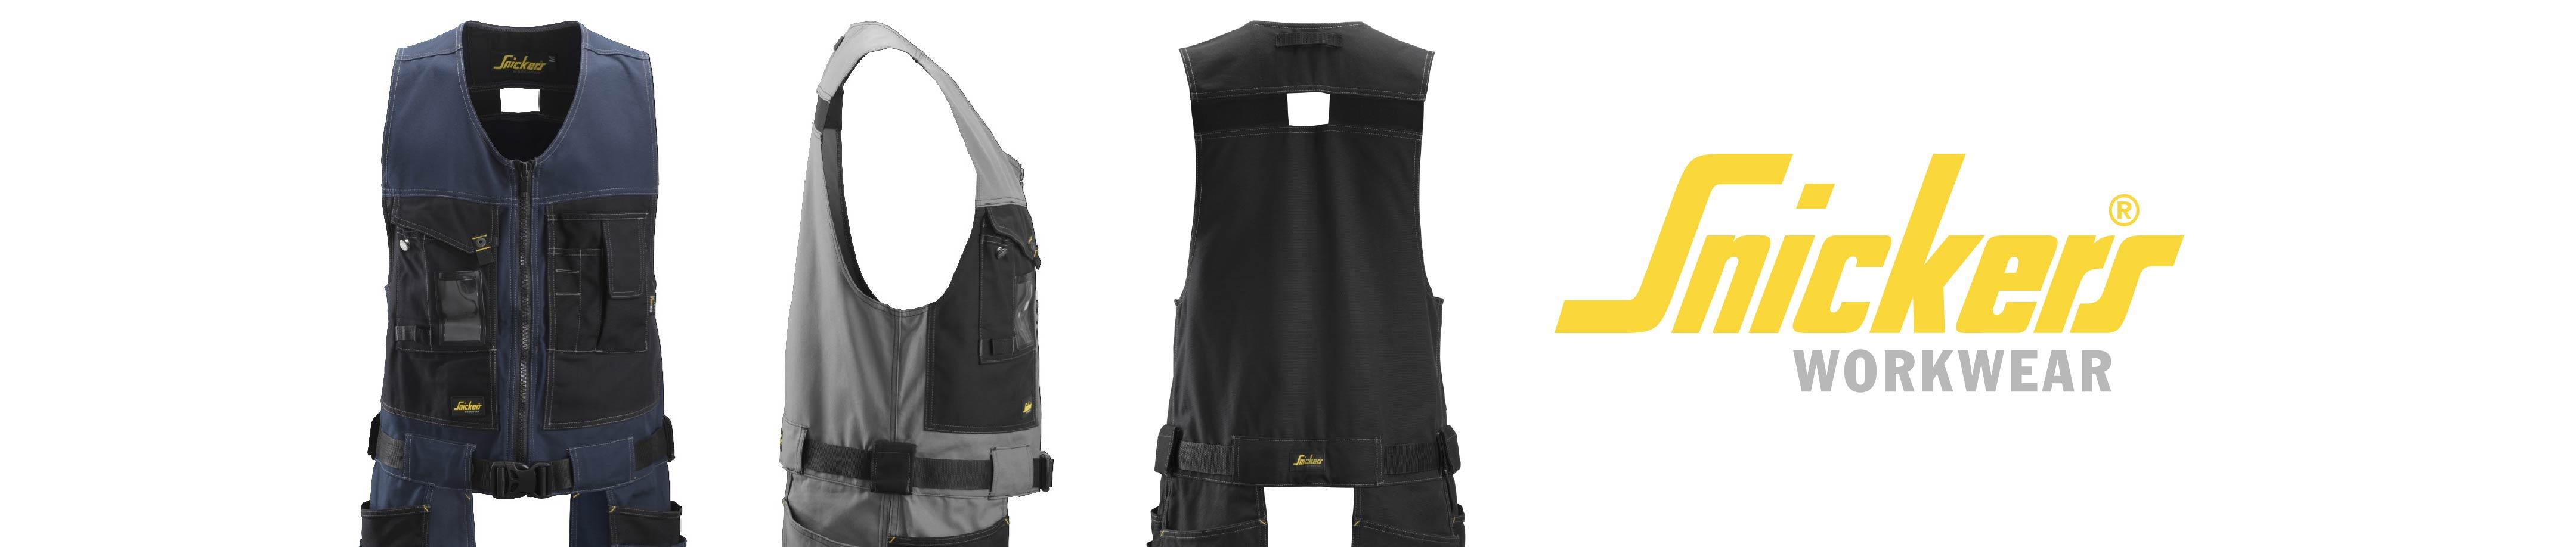 Tool vests